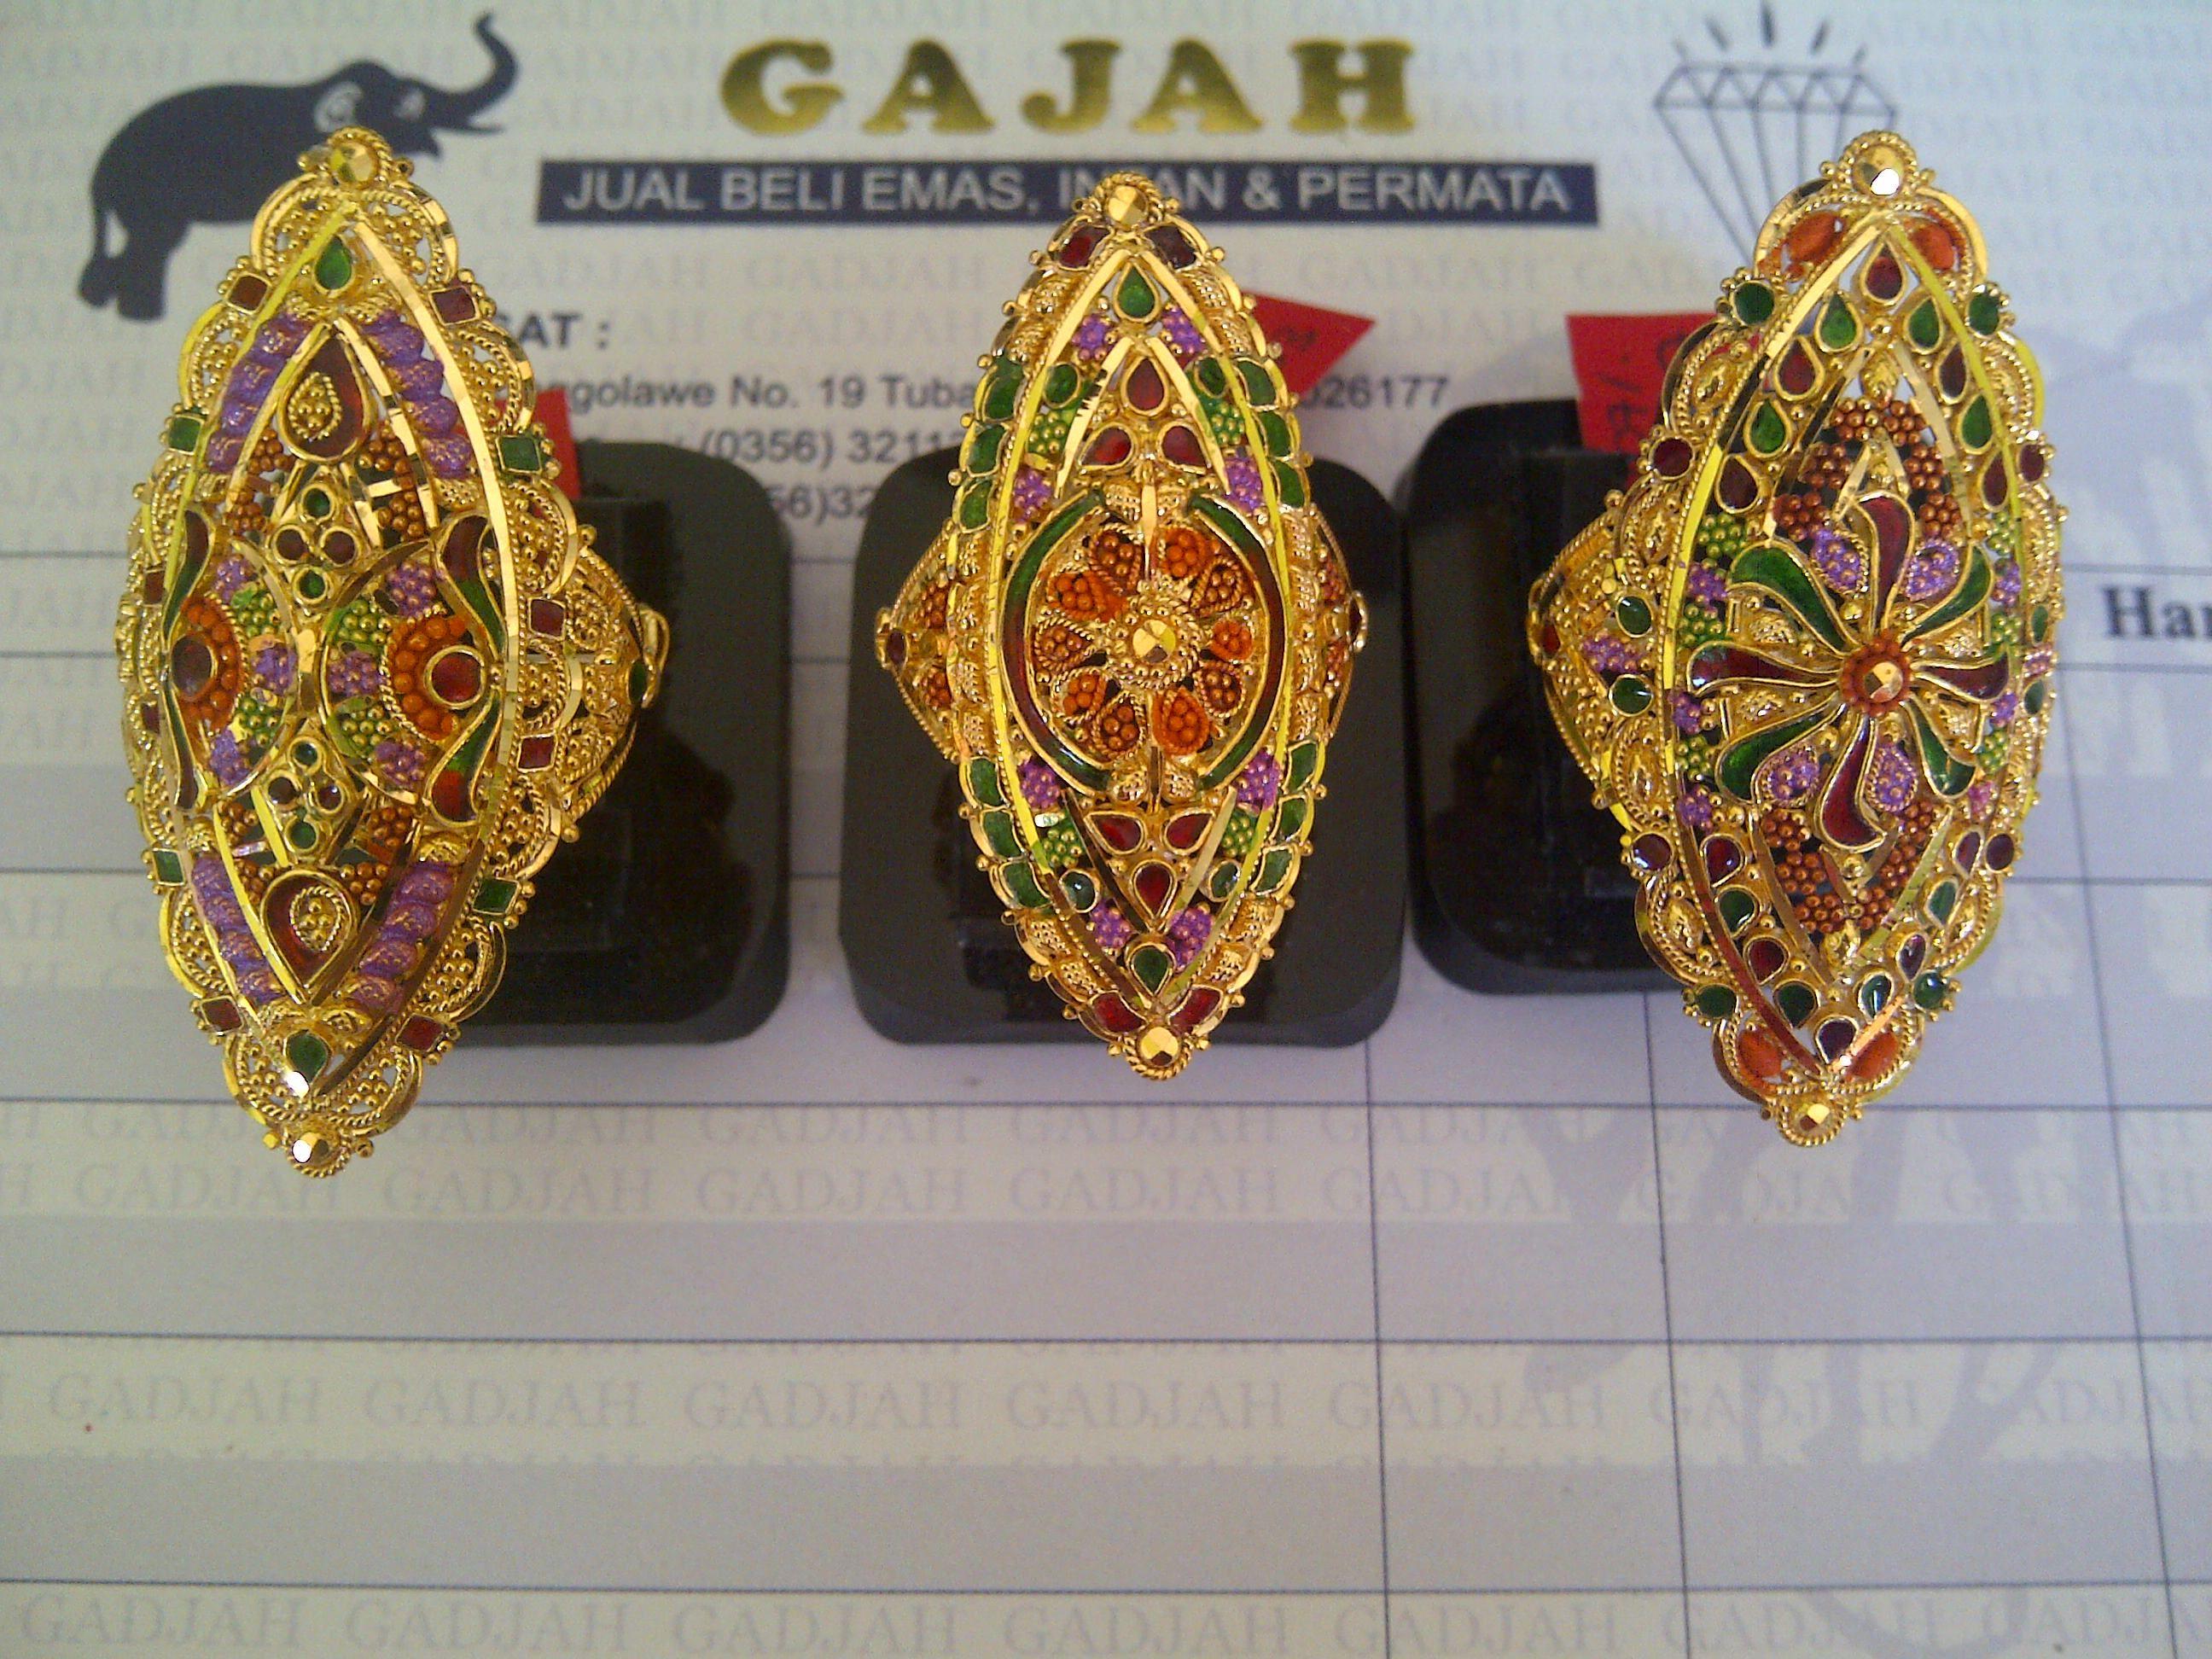 22k India / Dubai Gold Diamond shape Rings Classic